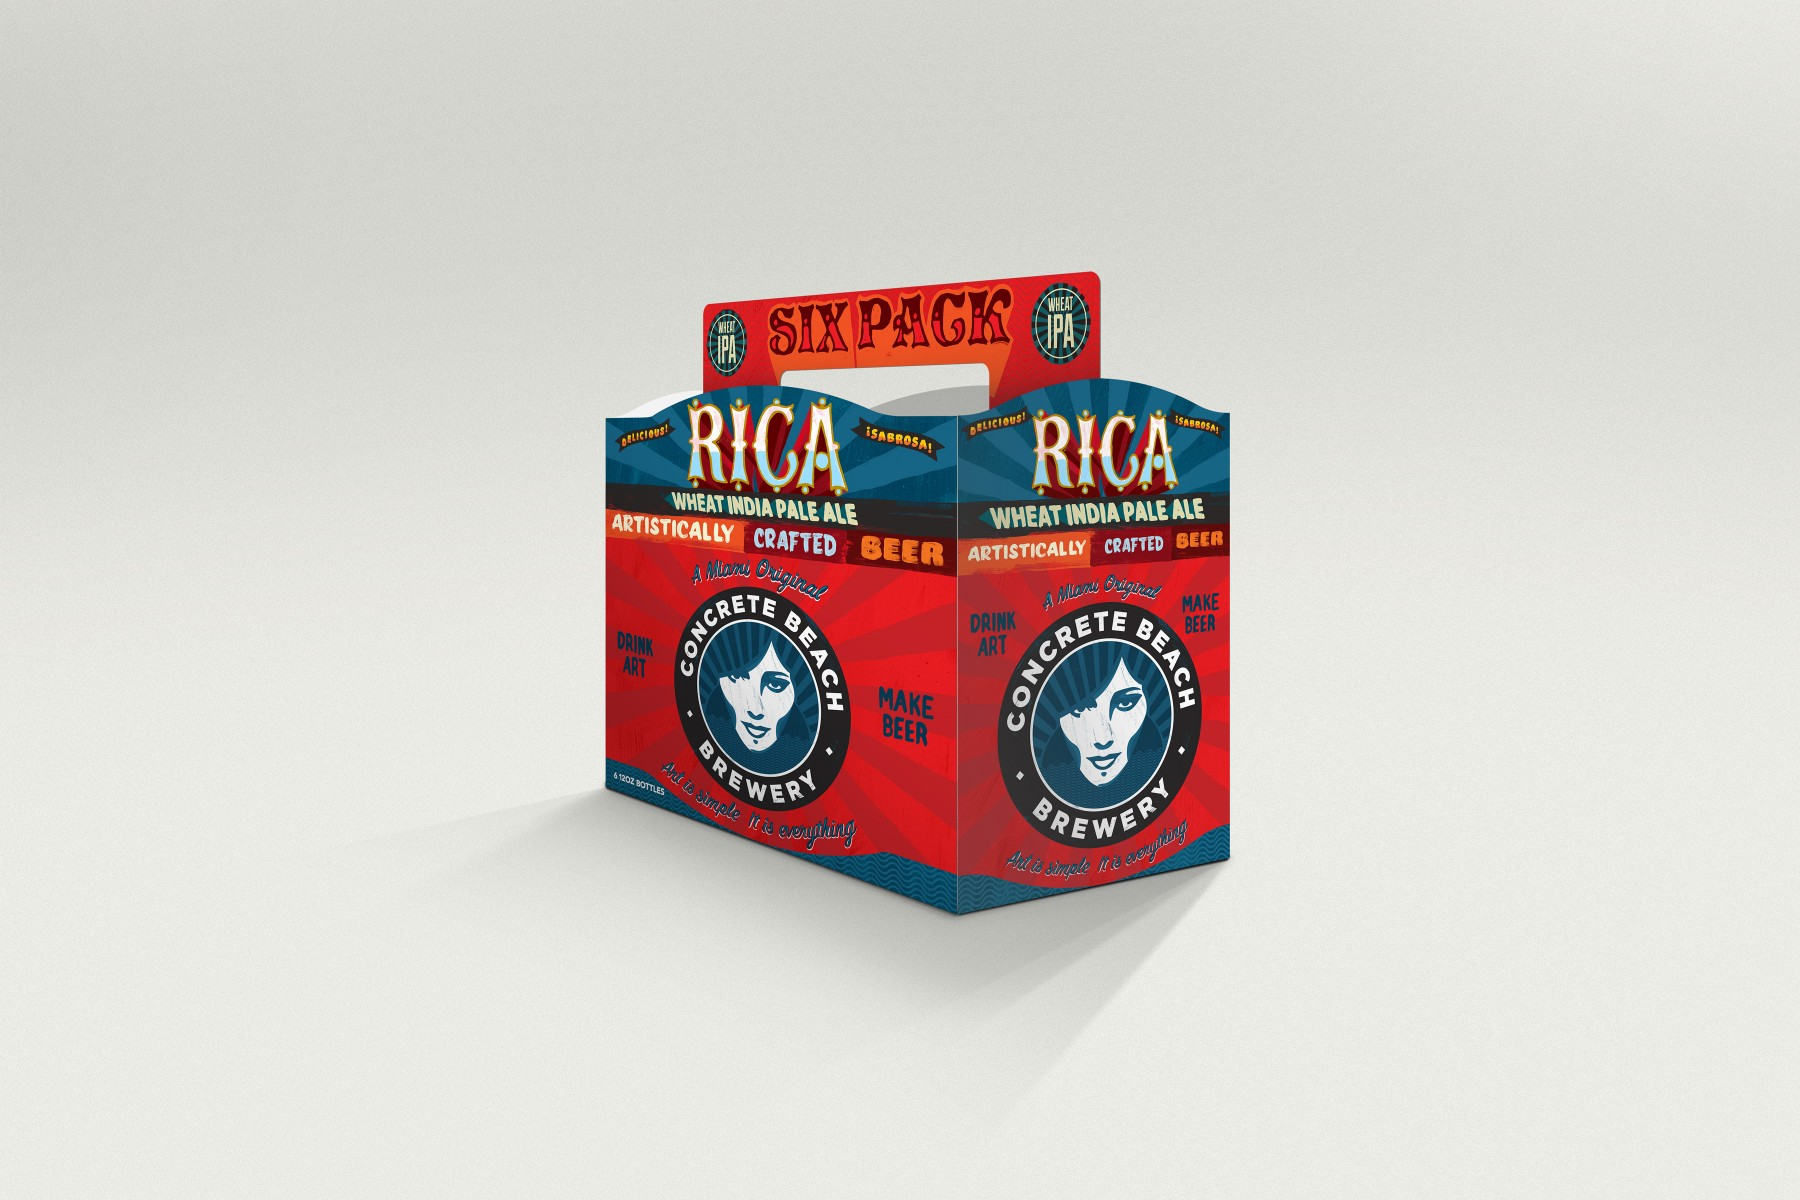 Rica 6-pack